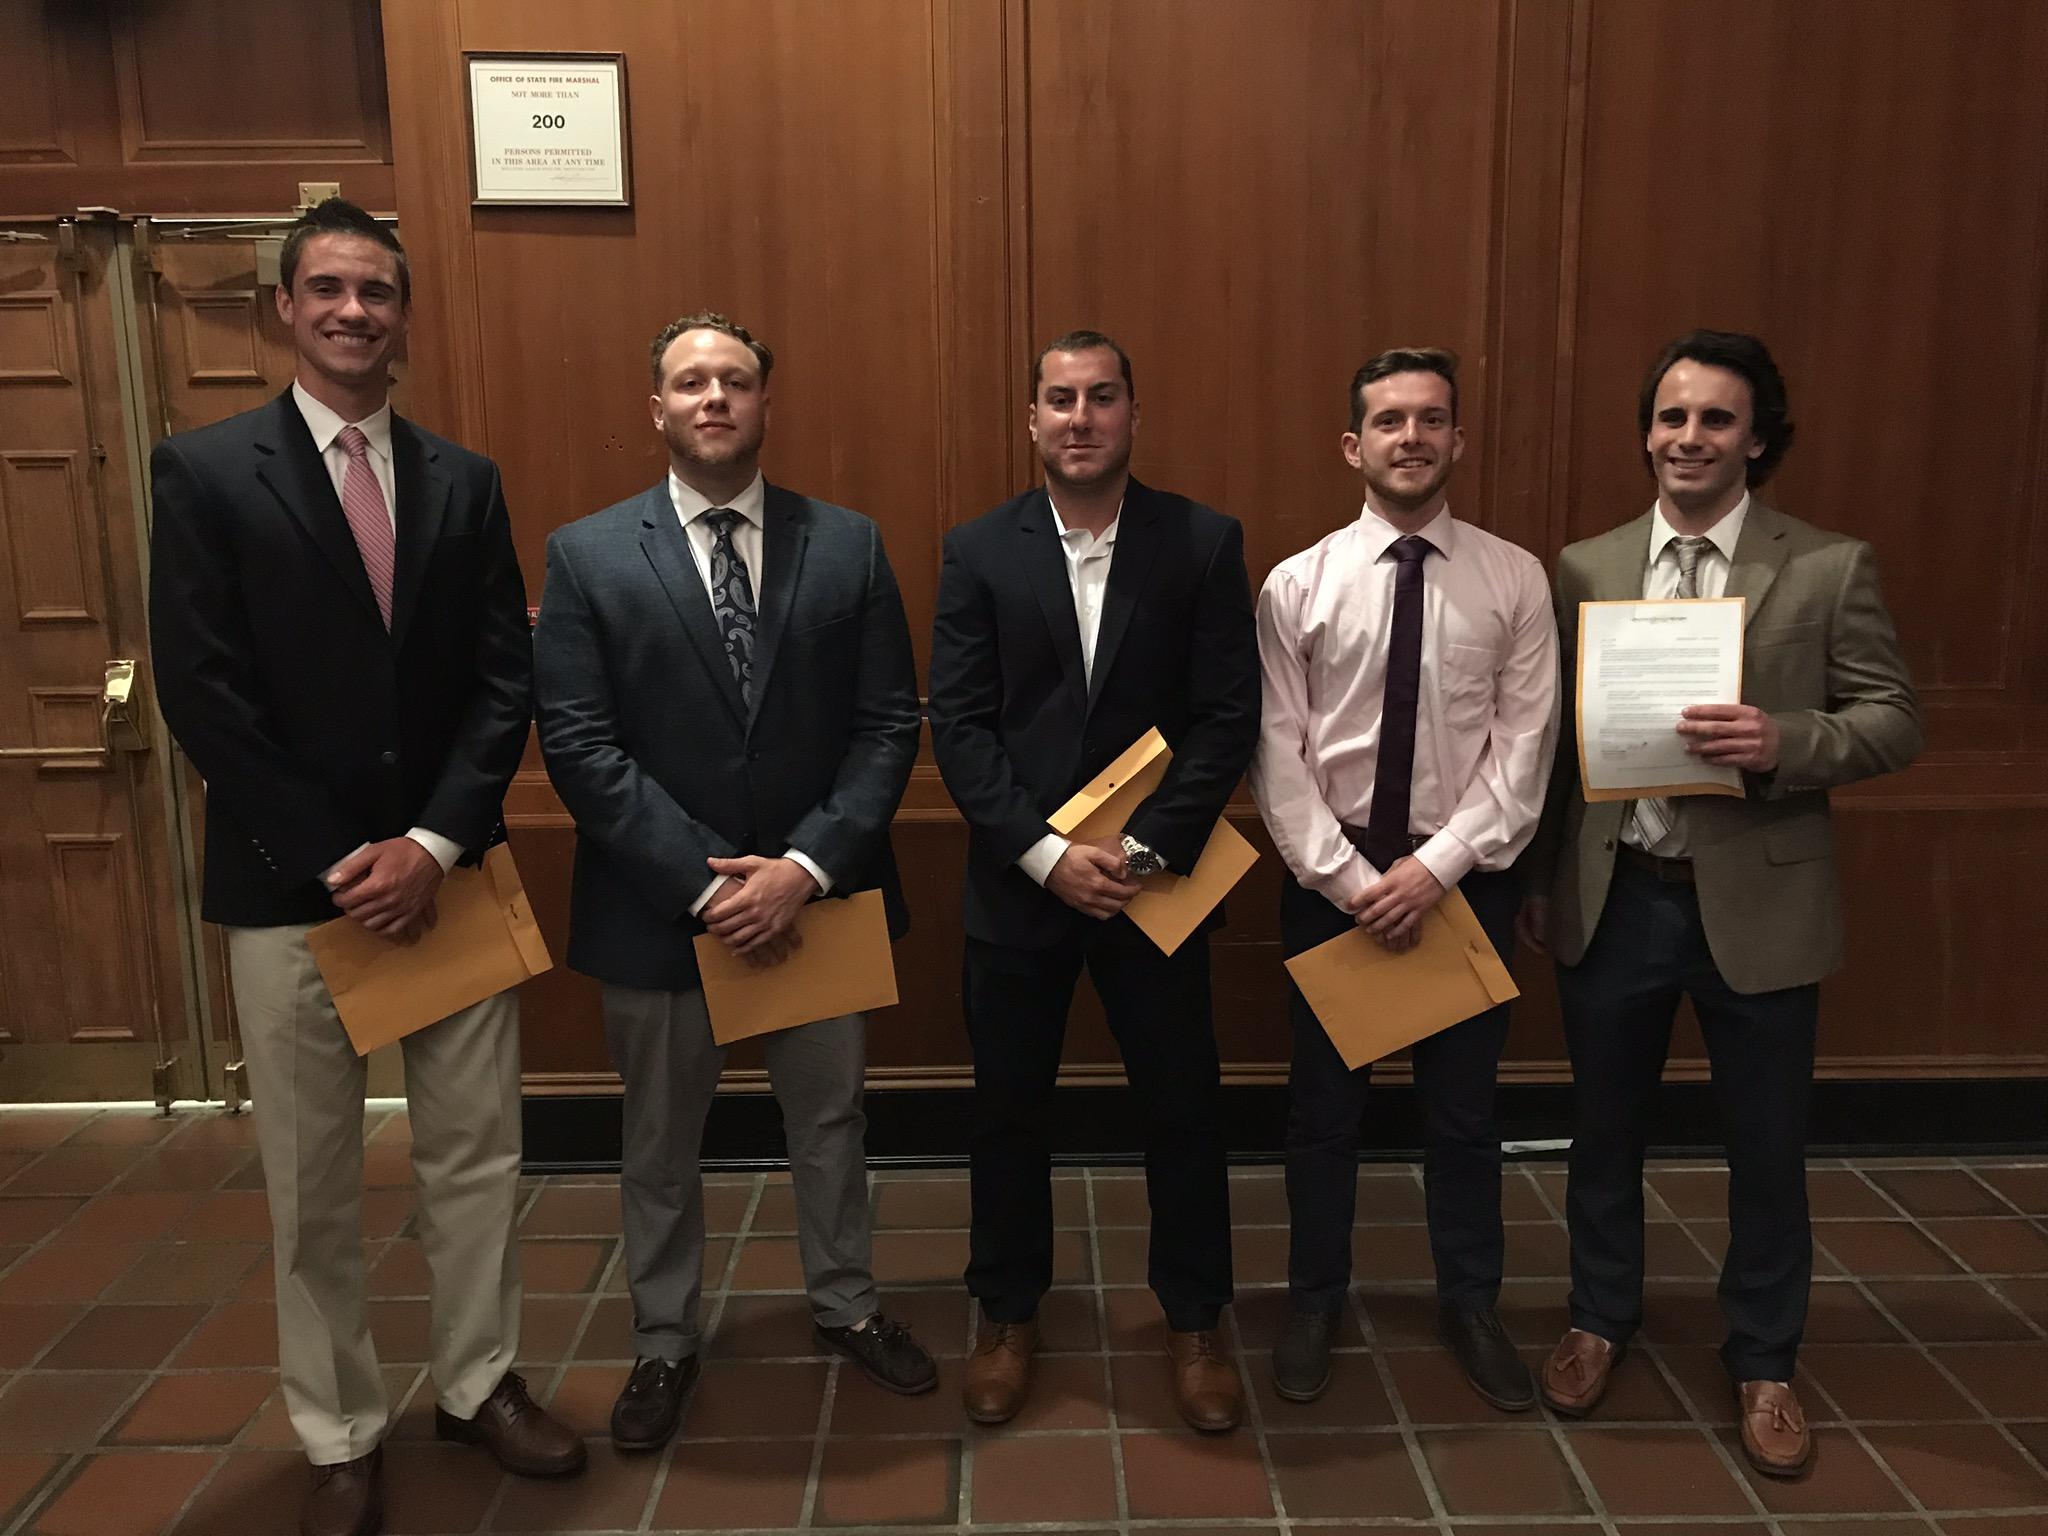 The 2019 ZGK - Salisbury University Award Recipients: Cal Aldersley, Damon Savastano, Frank Pipich, Brendan Fagan, Martin Kristian